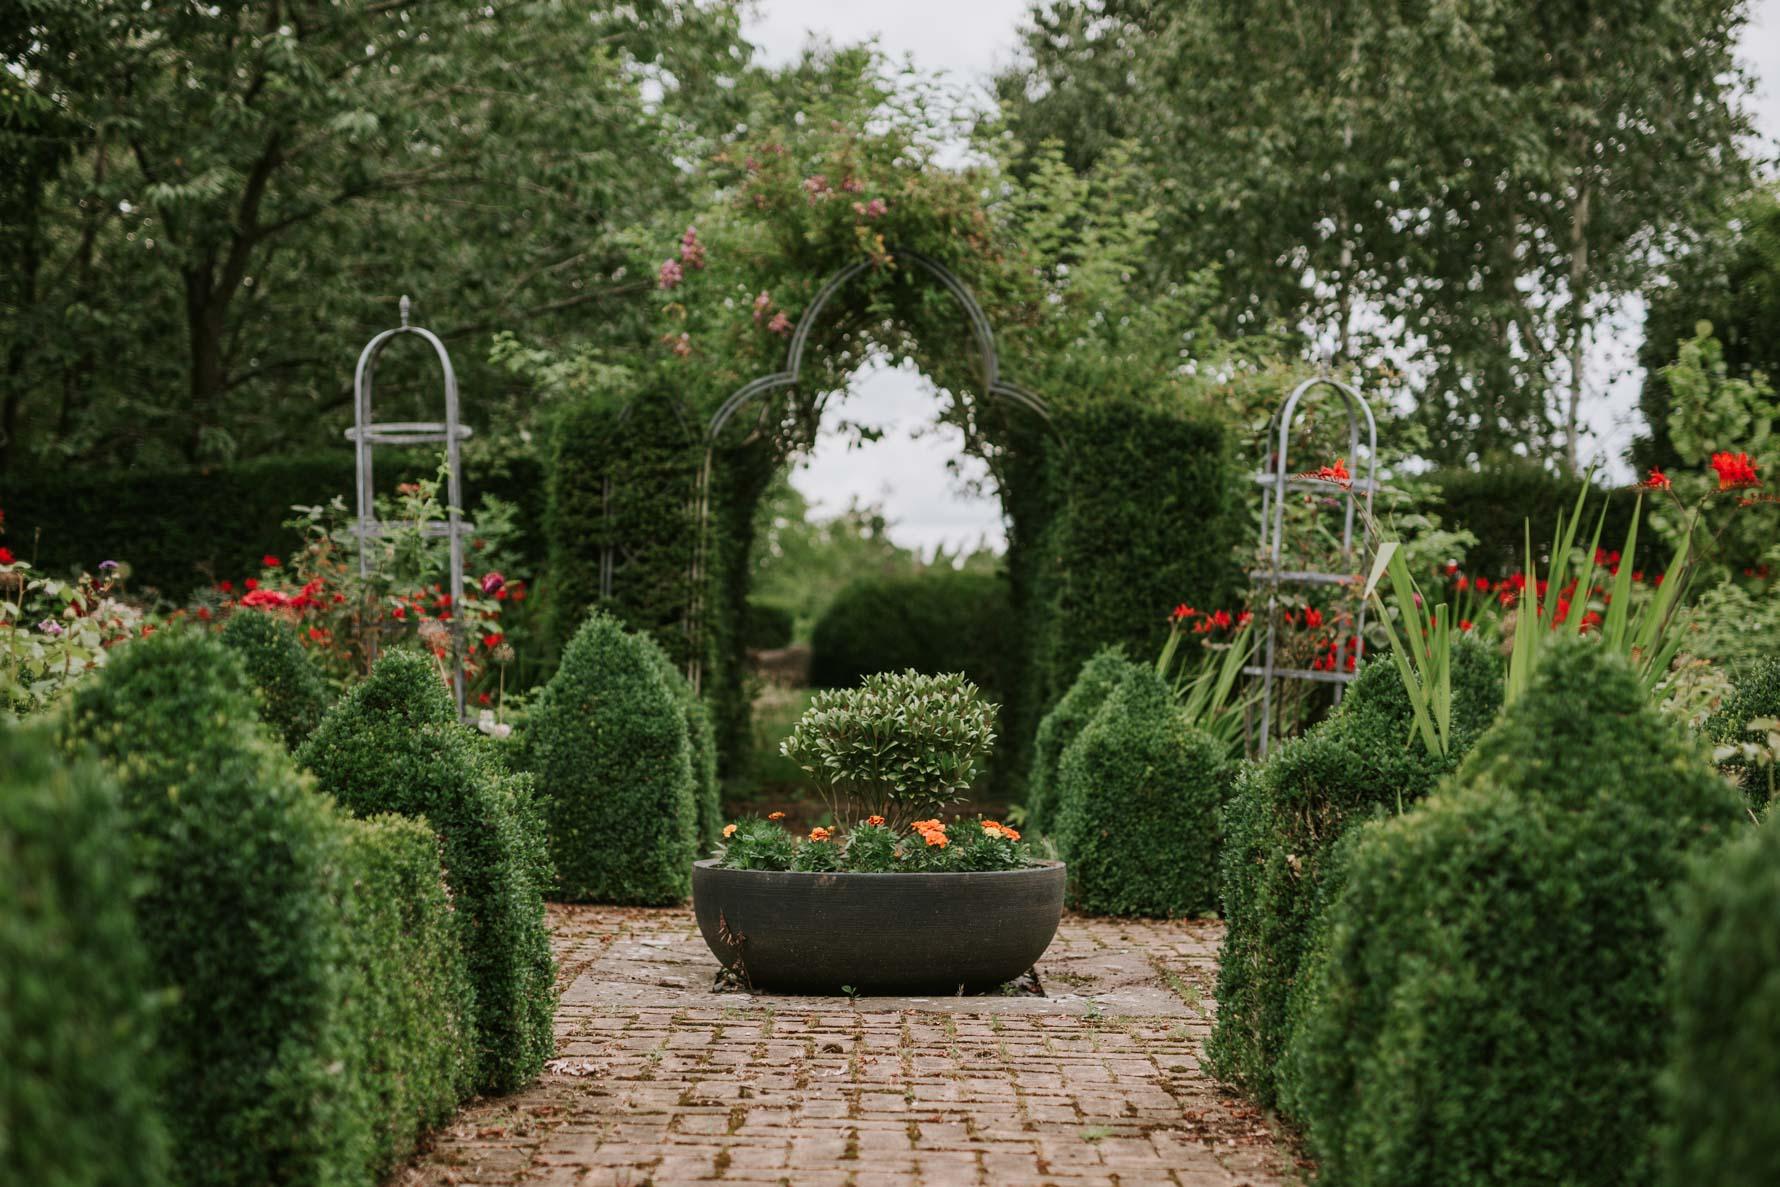 Ladywood estate wedding planter in beautiful garden